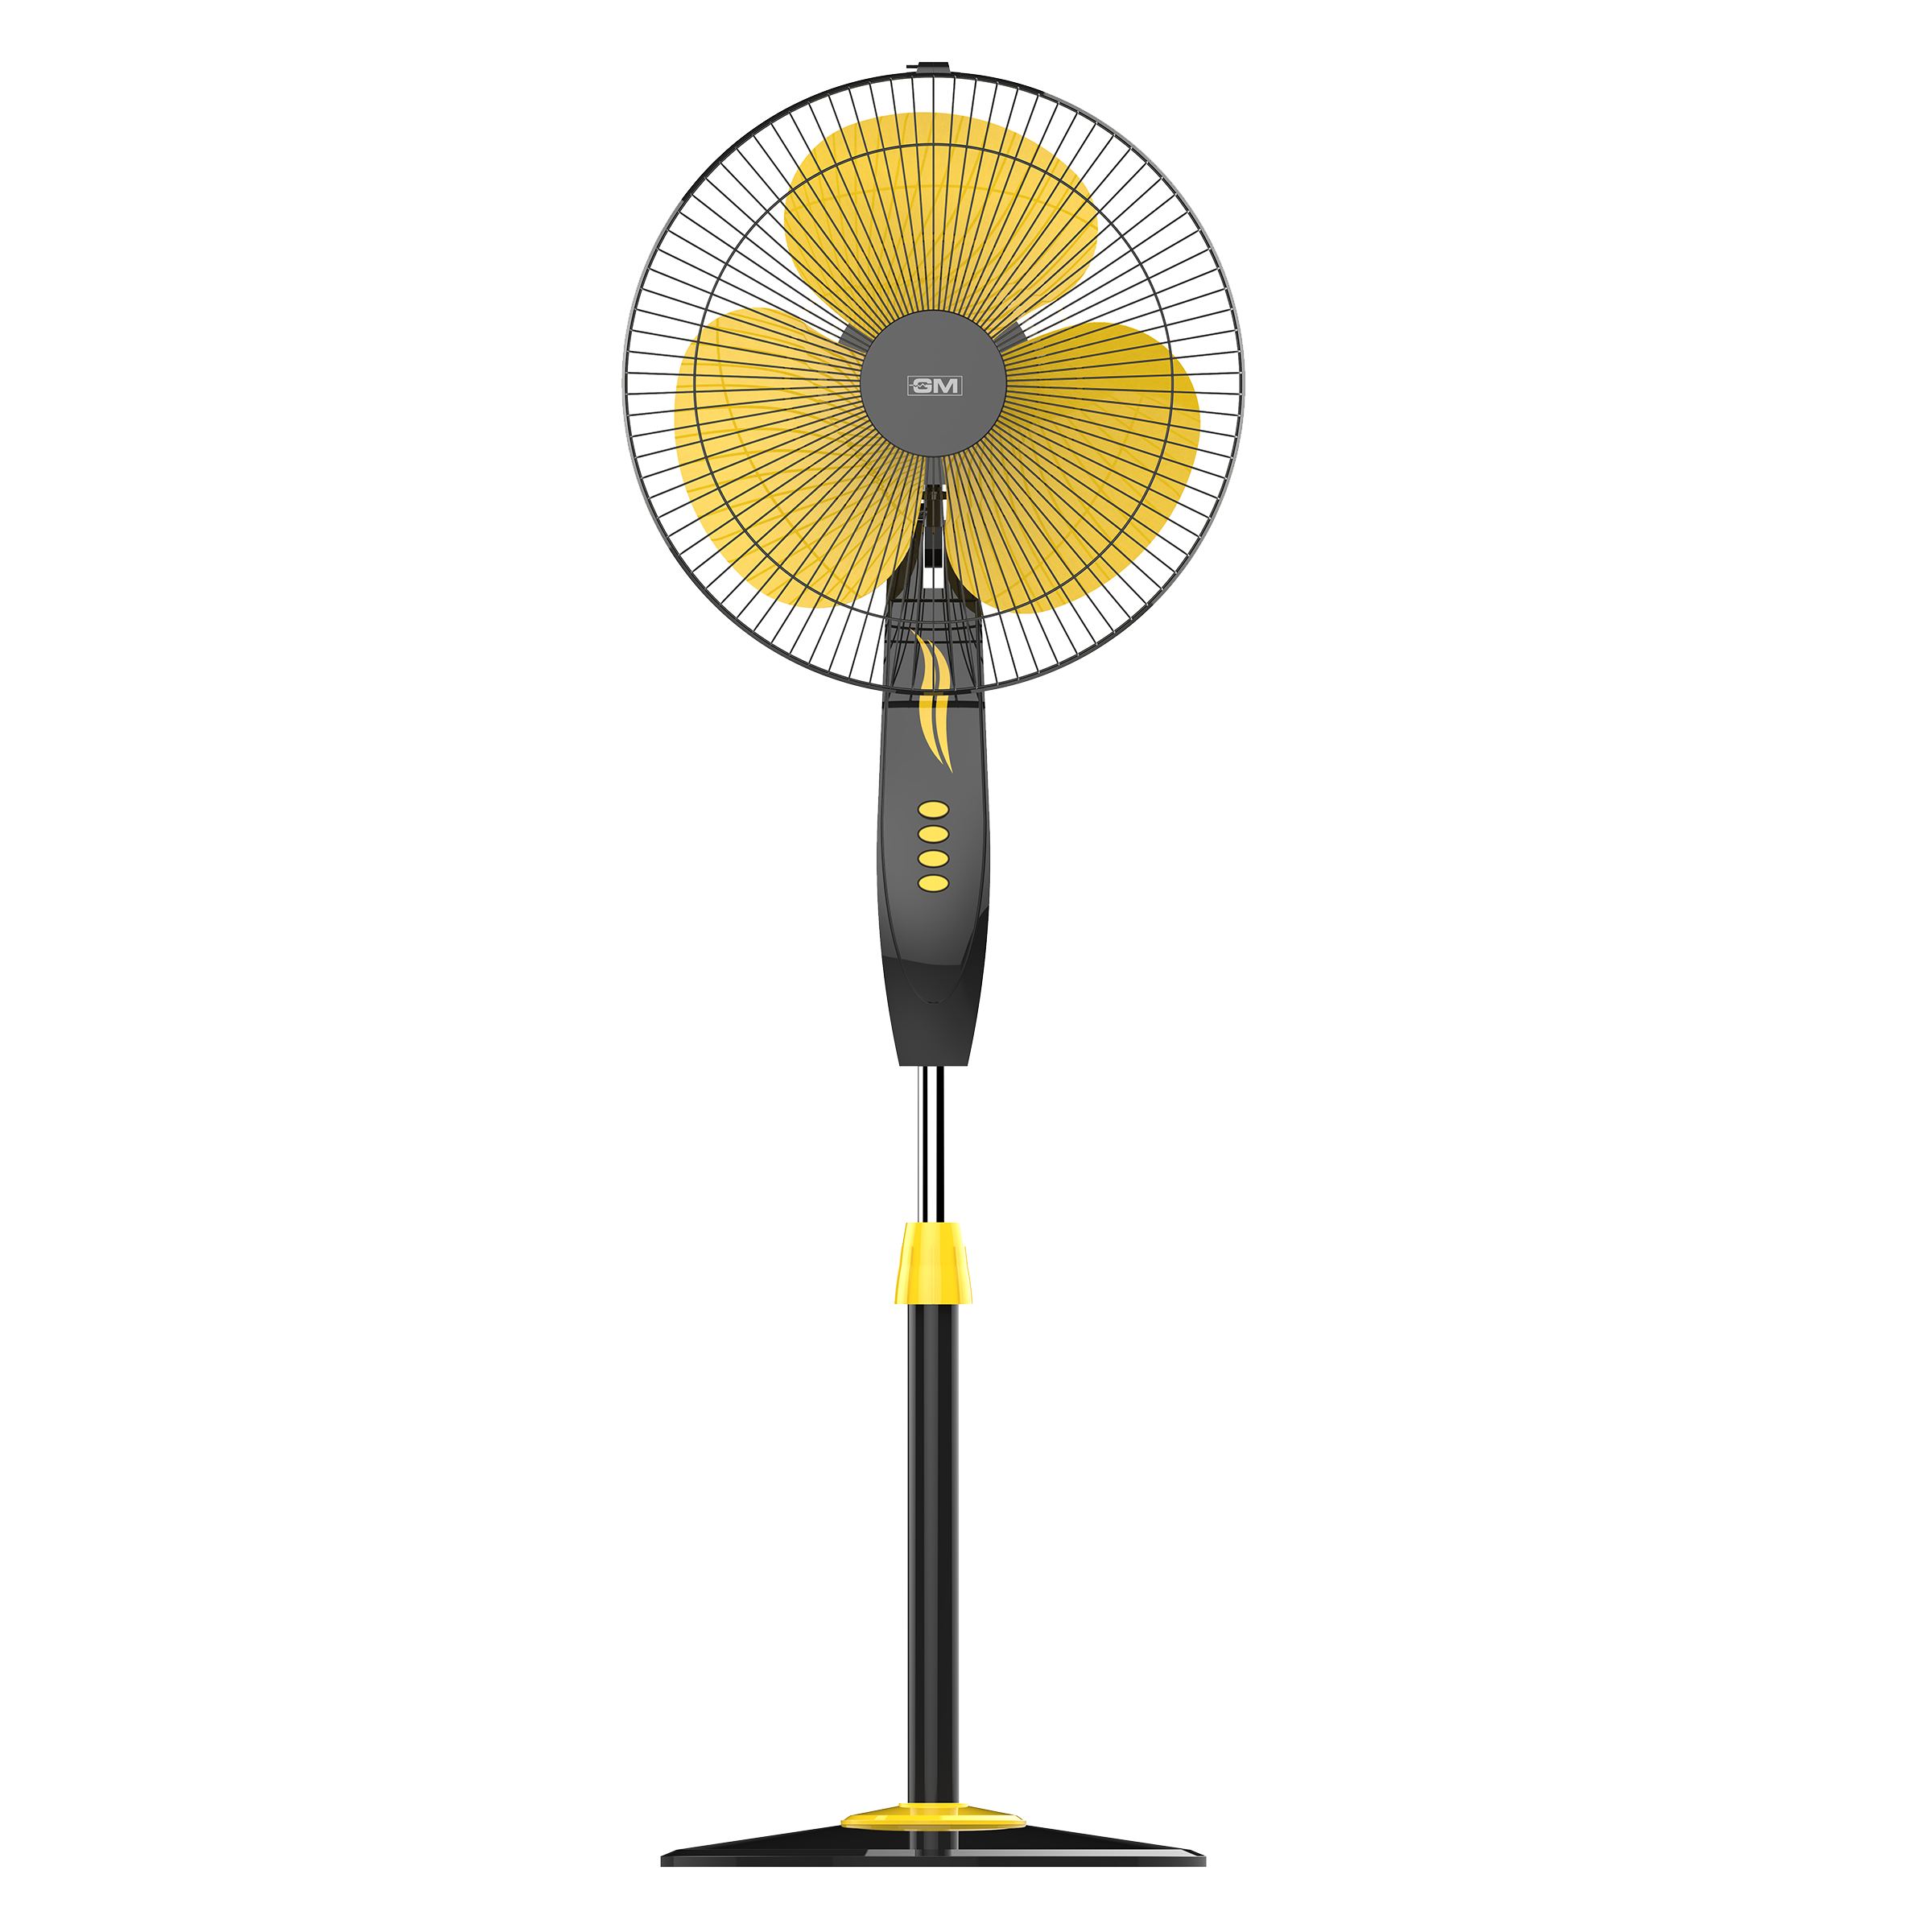 GM Livo Plus 40 cm Sweep 3 Blade Pedestal Fan (Noiseless Fan, PFB160025YLGL, Yellow)_1